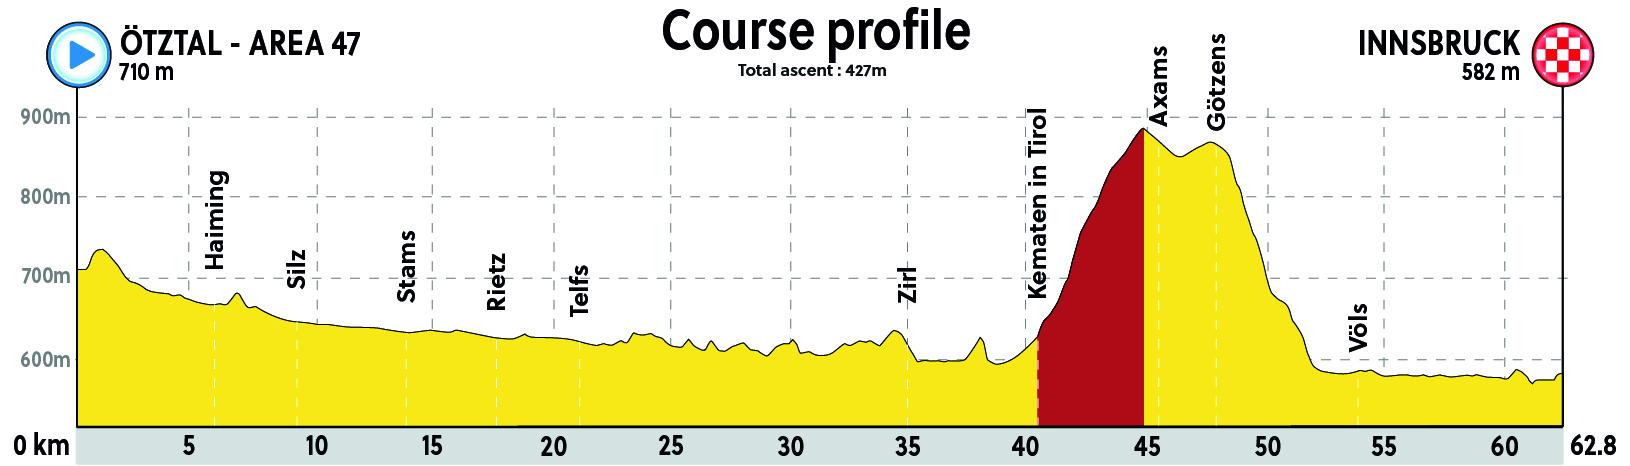 UCI TTT World Championships/CRE (23 spt) os inscribis vosotros Innsbruck_2018_CRE_Masc